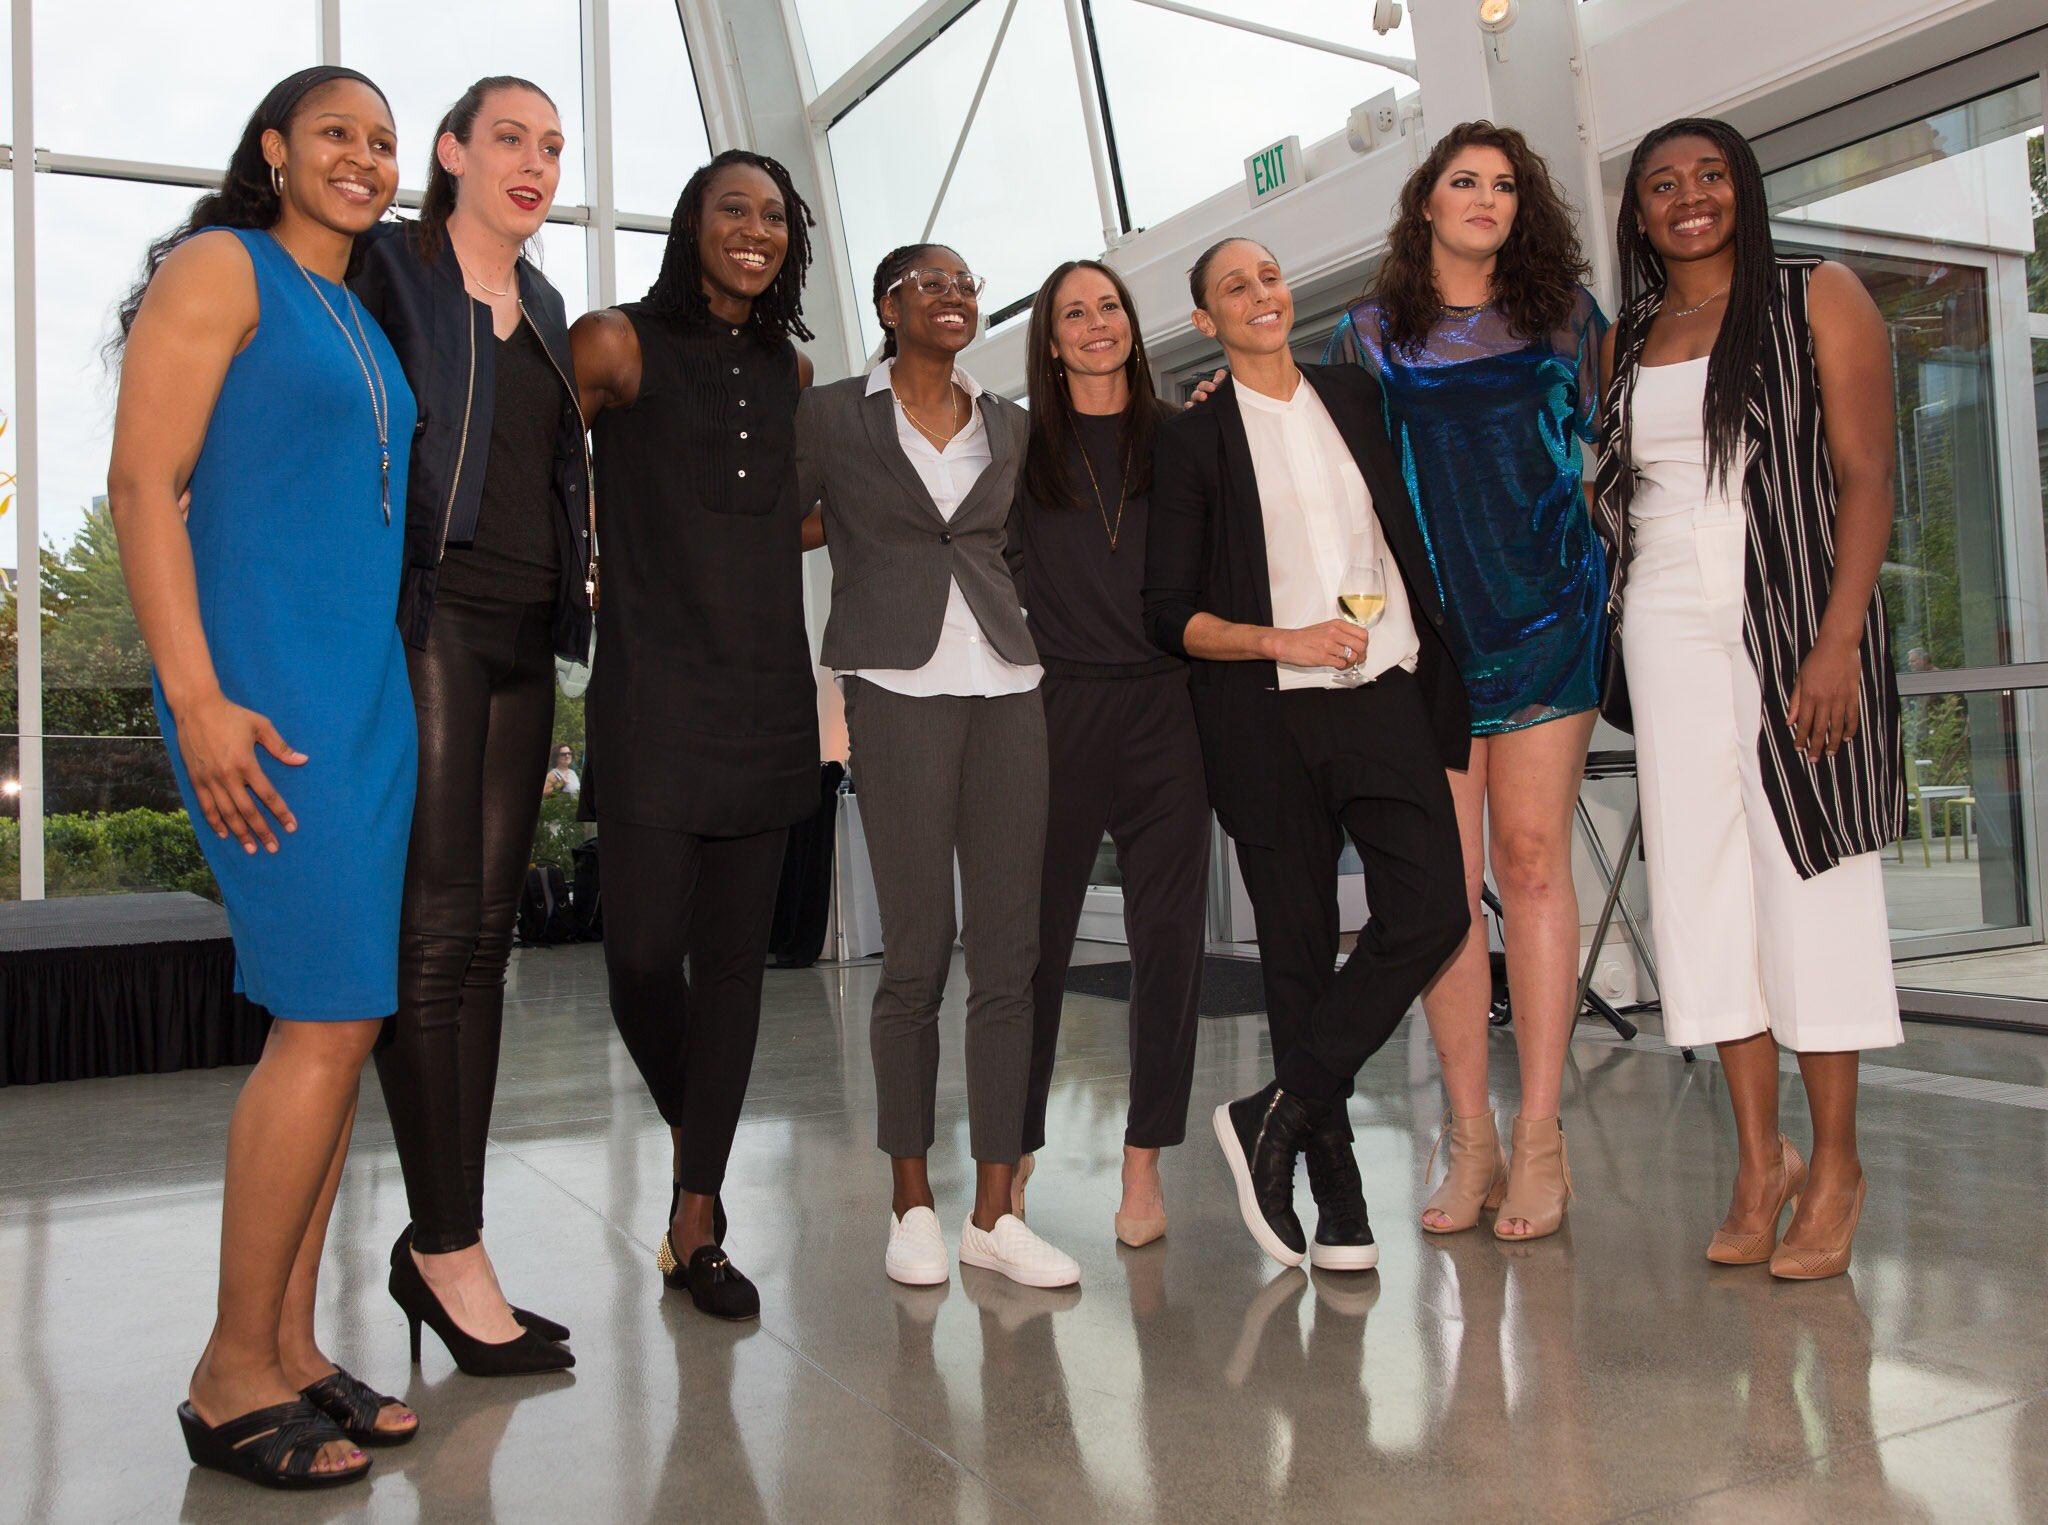 WNBA Gossip dating